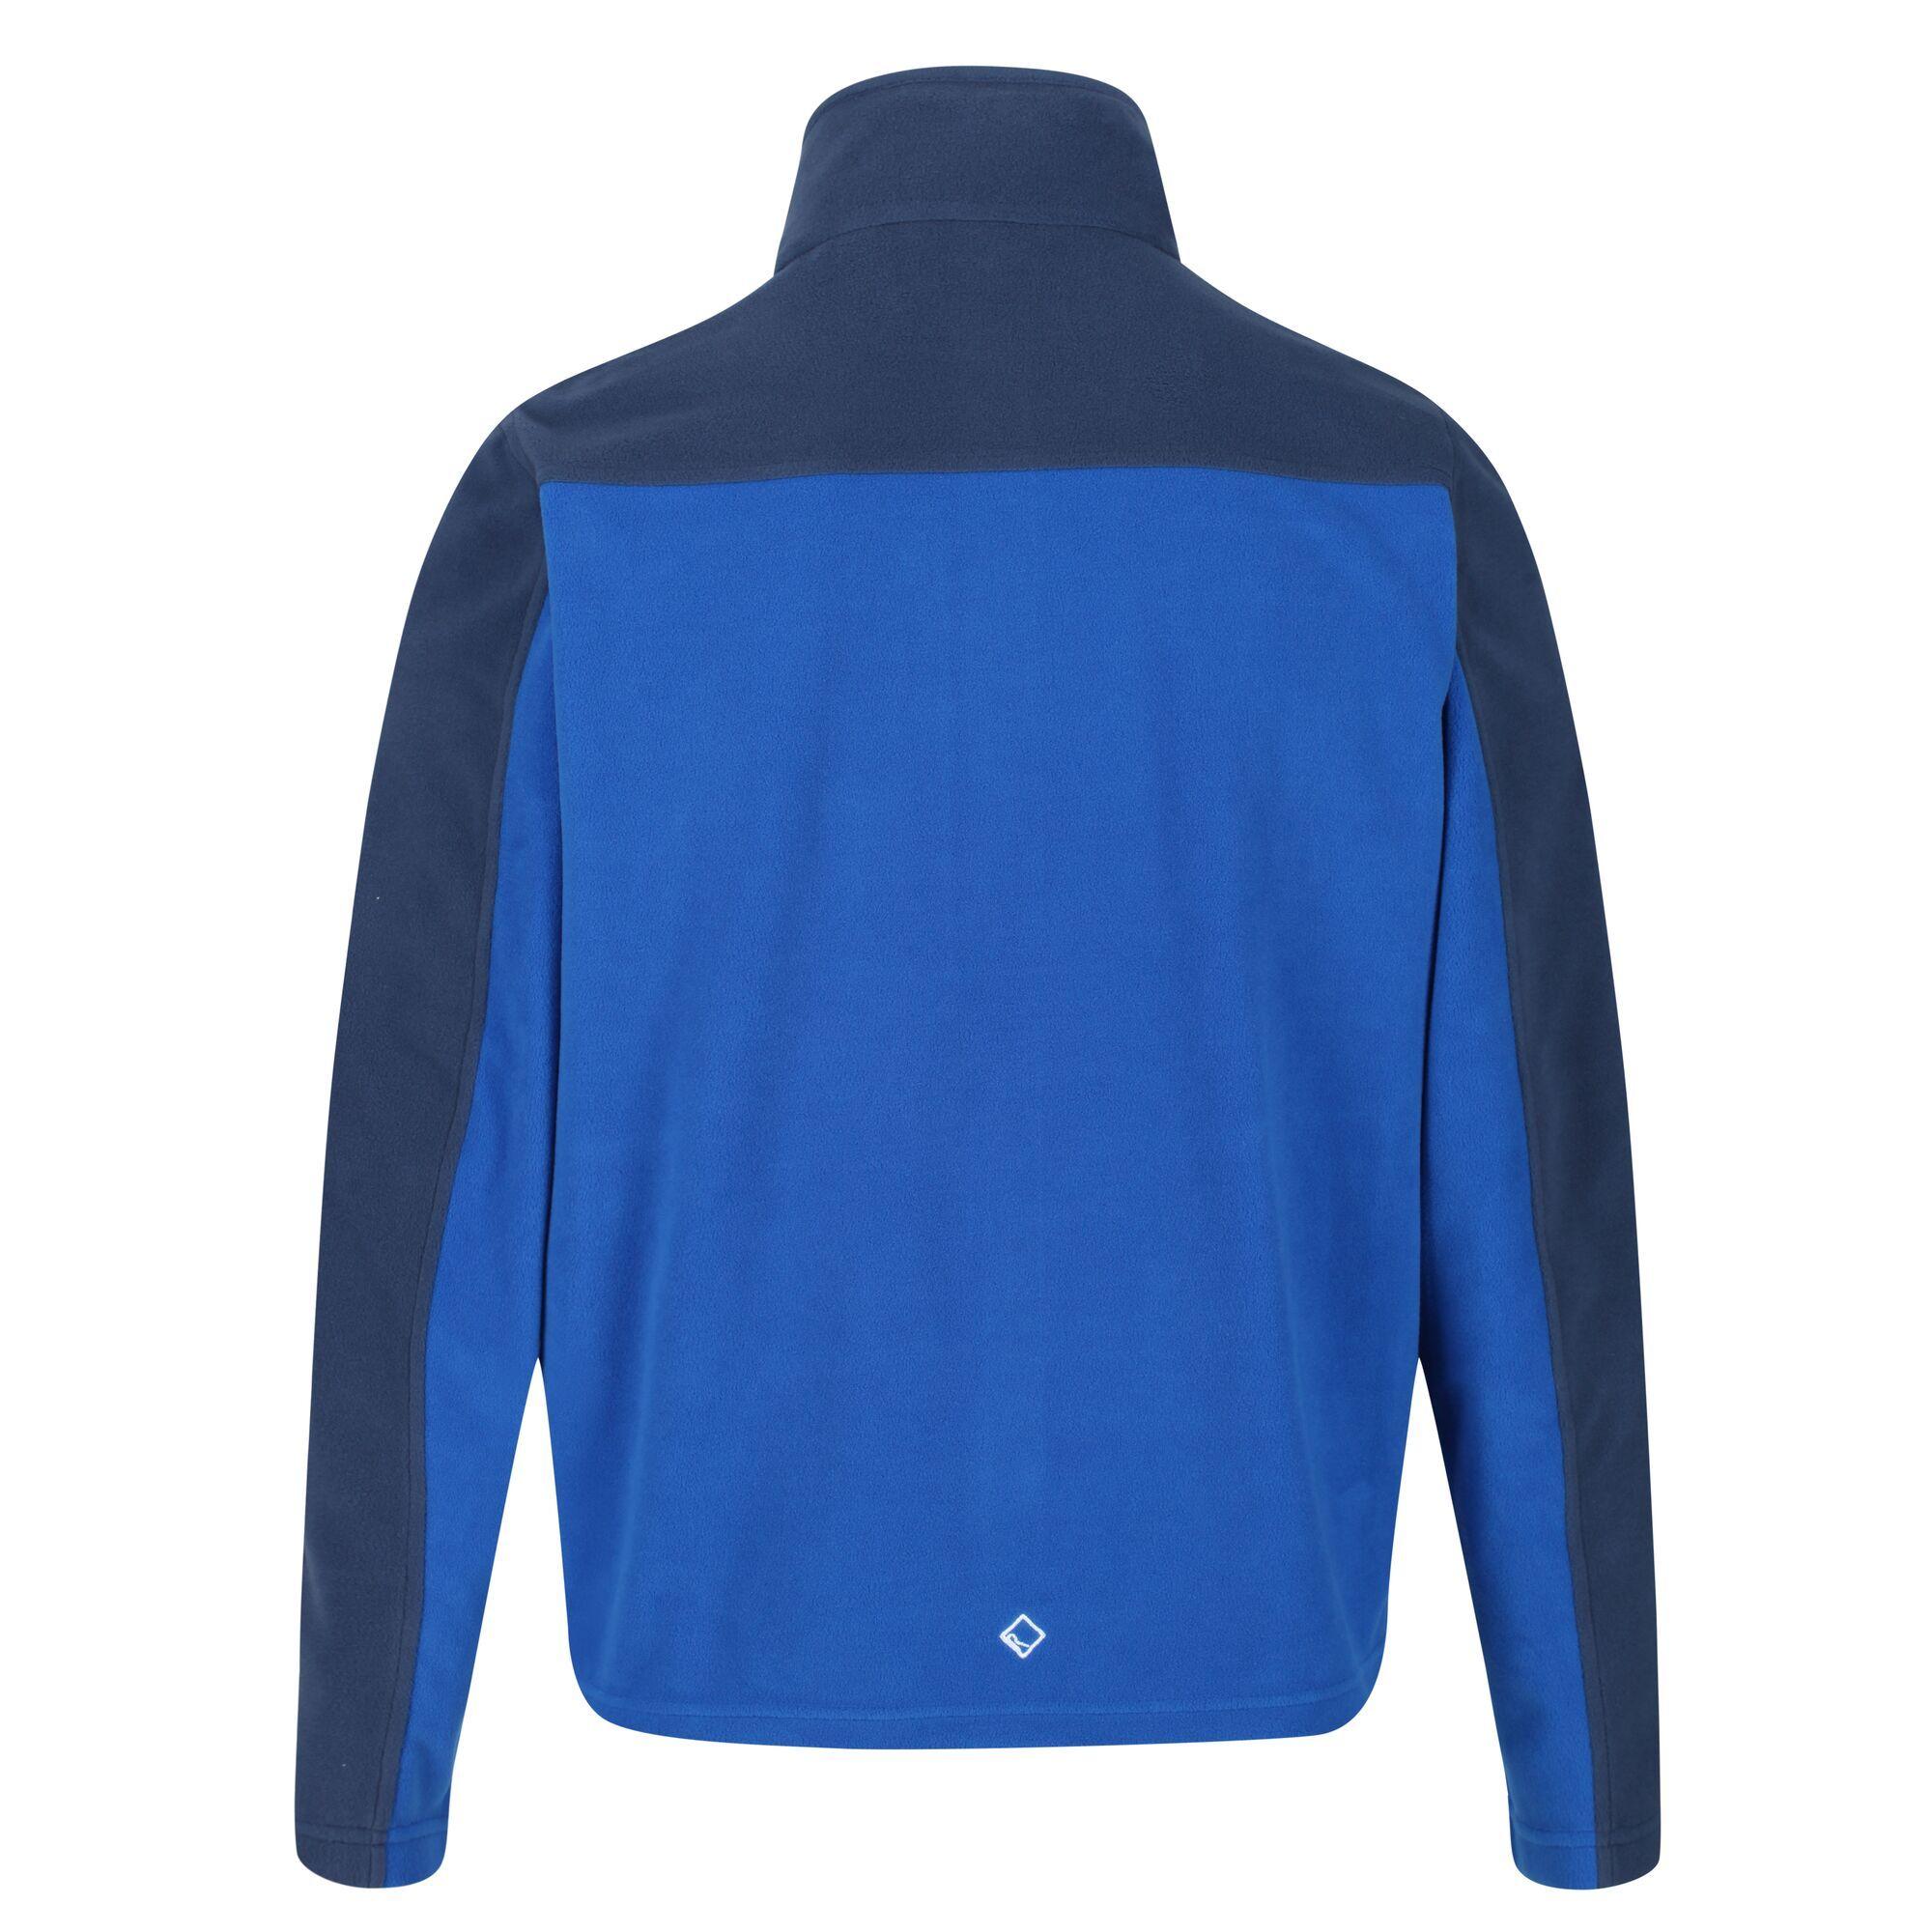 thumbnail 5 - Regatta Fellard Mens Lightweight Full Zip Warm Walking Fleece Jacket RRP £30